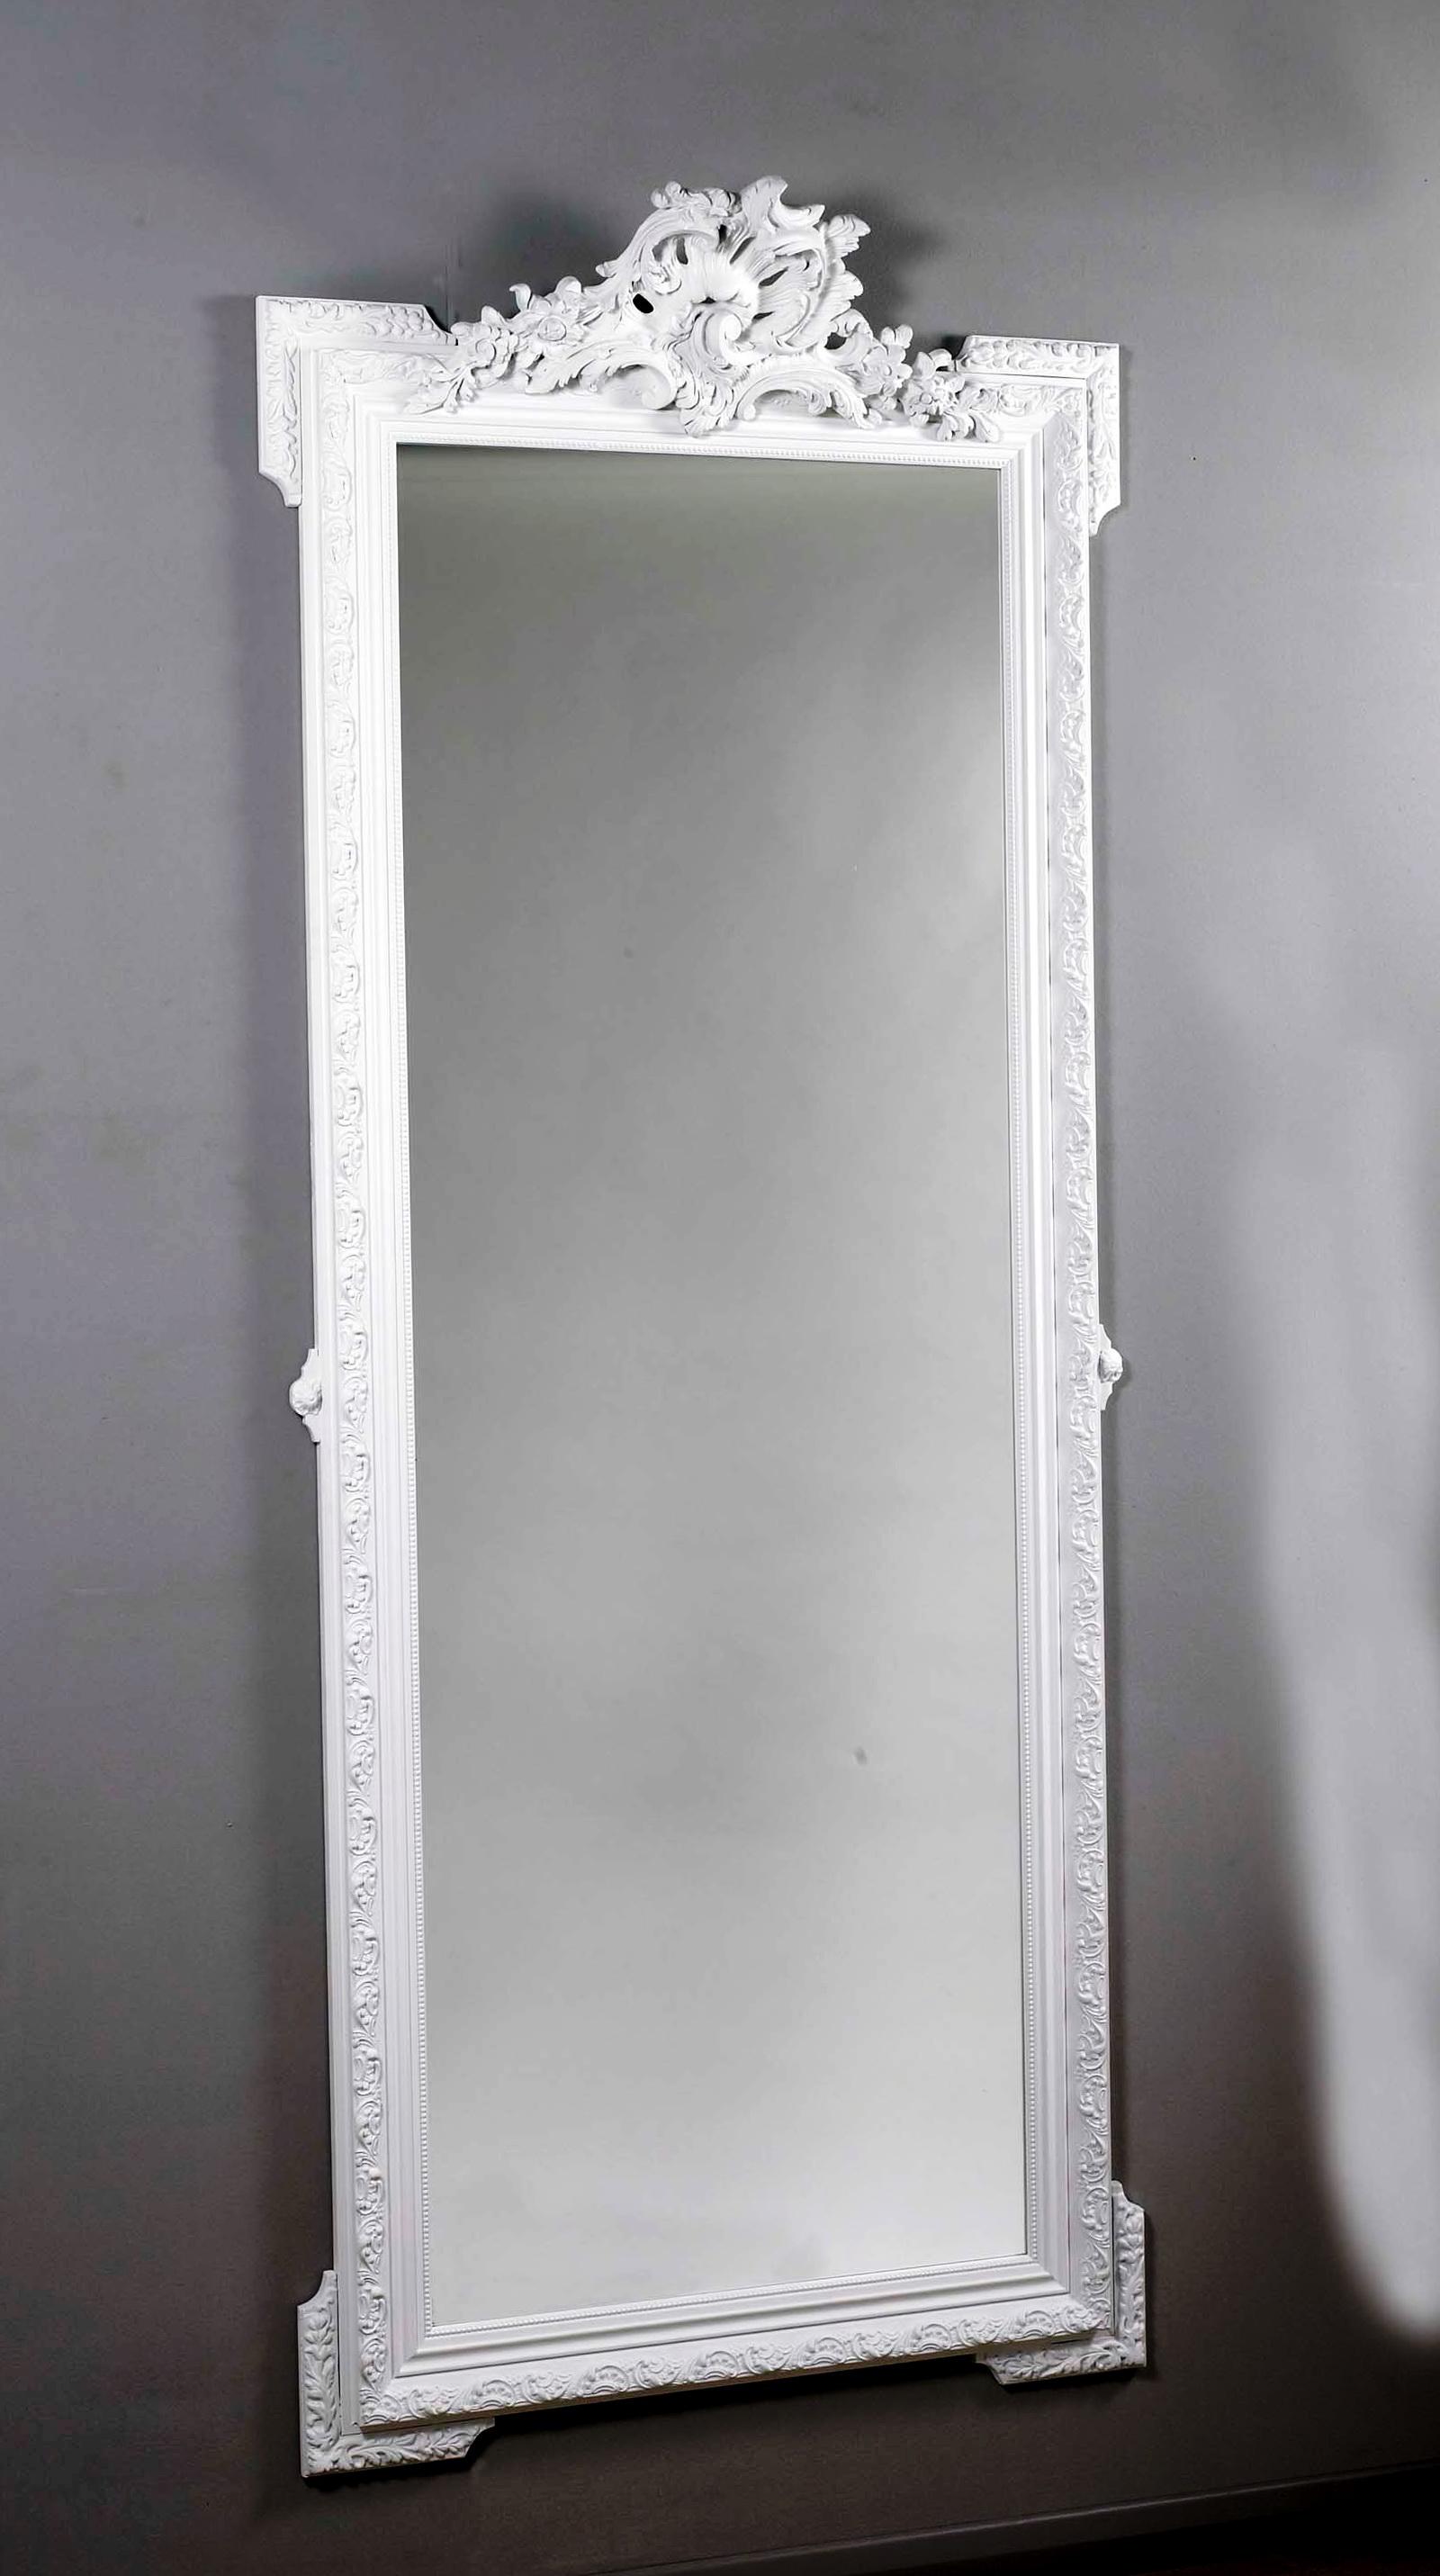 White Full Length Wall Mirror